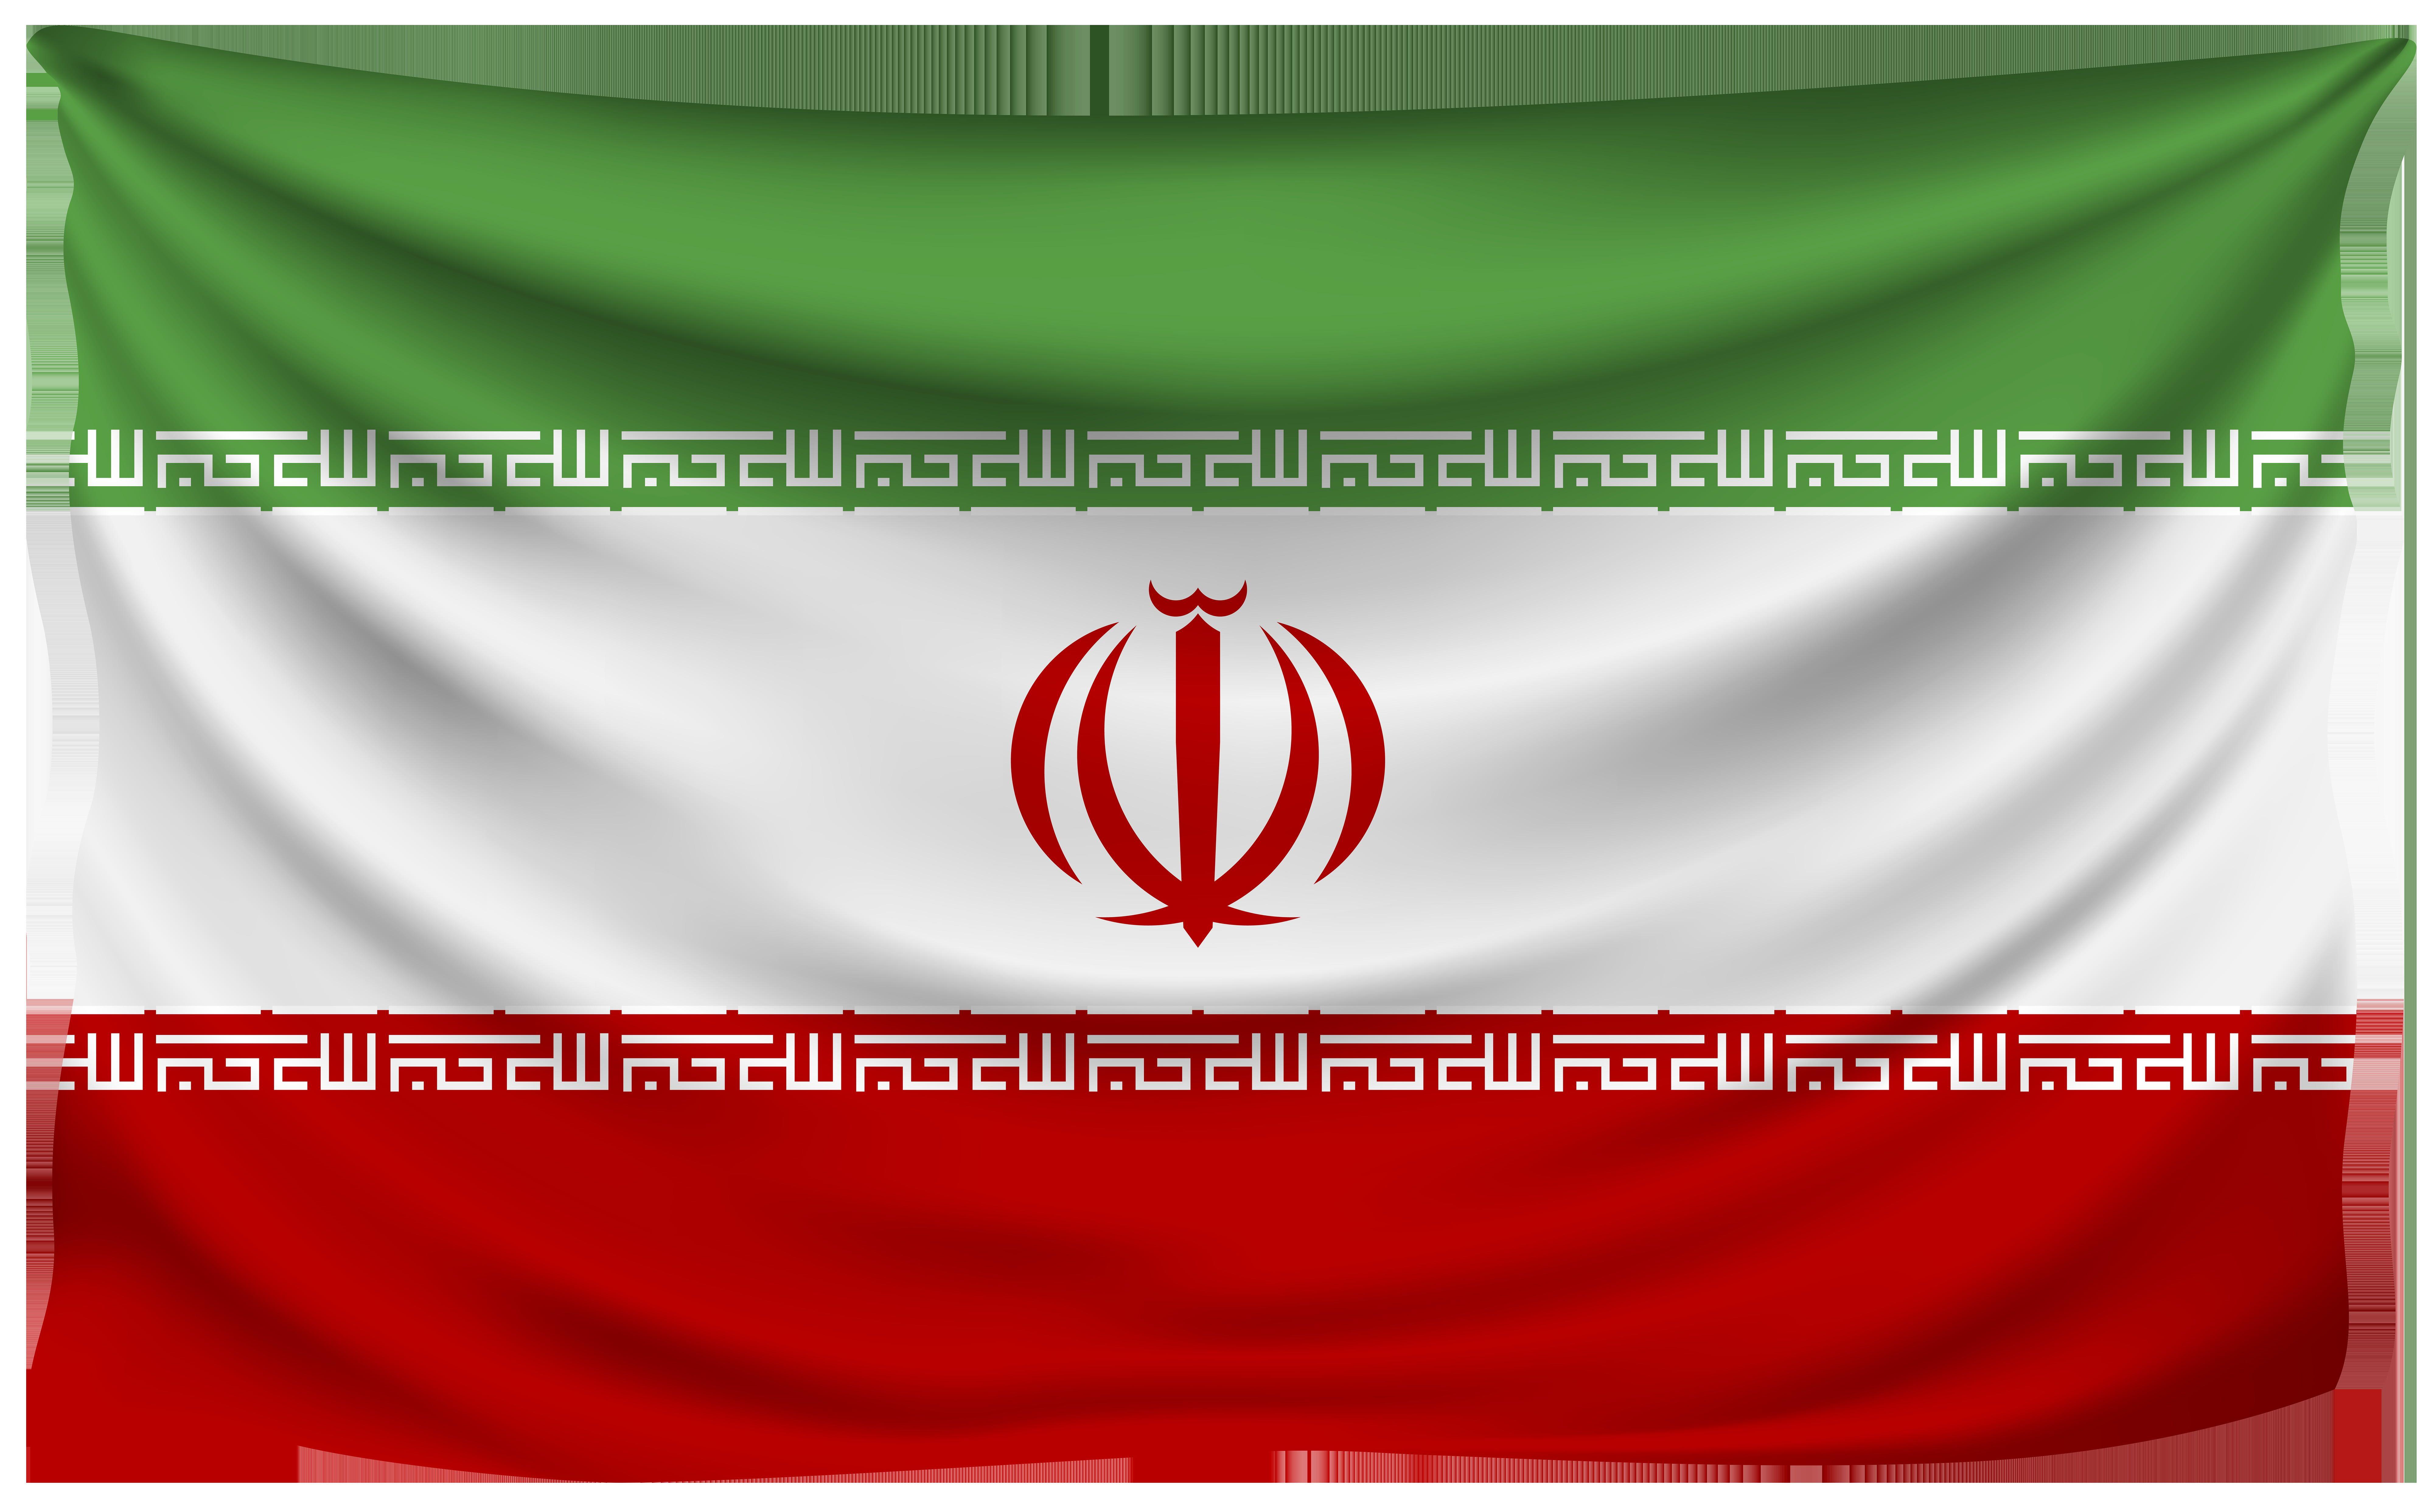 Flags Flag Of Iran Flag Flag Of Iran Iranian Flag 8k Wallpaper Hdwallpaper Desktop In 2020 Iran Flag Iran Flag